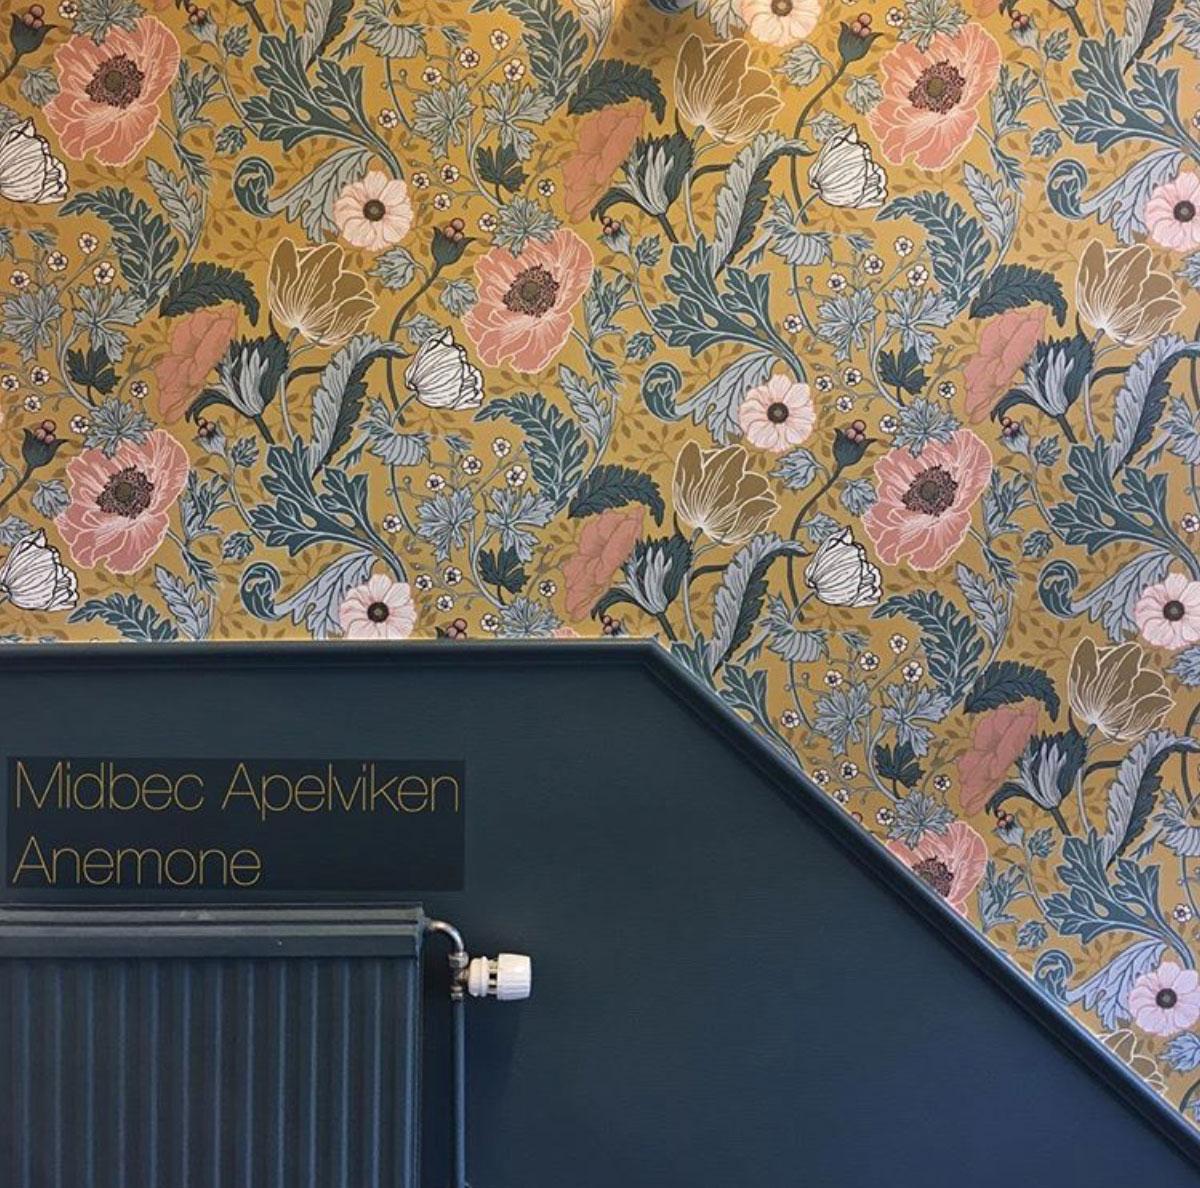 kulörer till tapet Anemone gul midbec tapeter